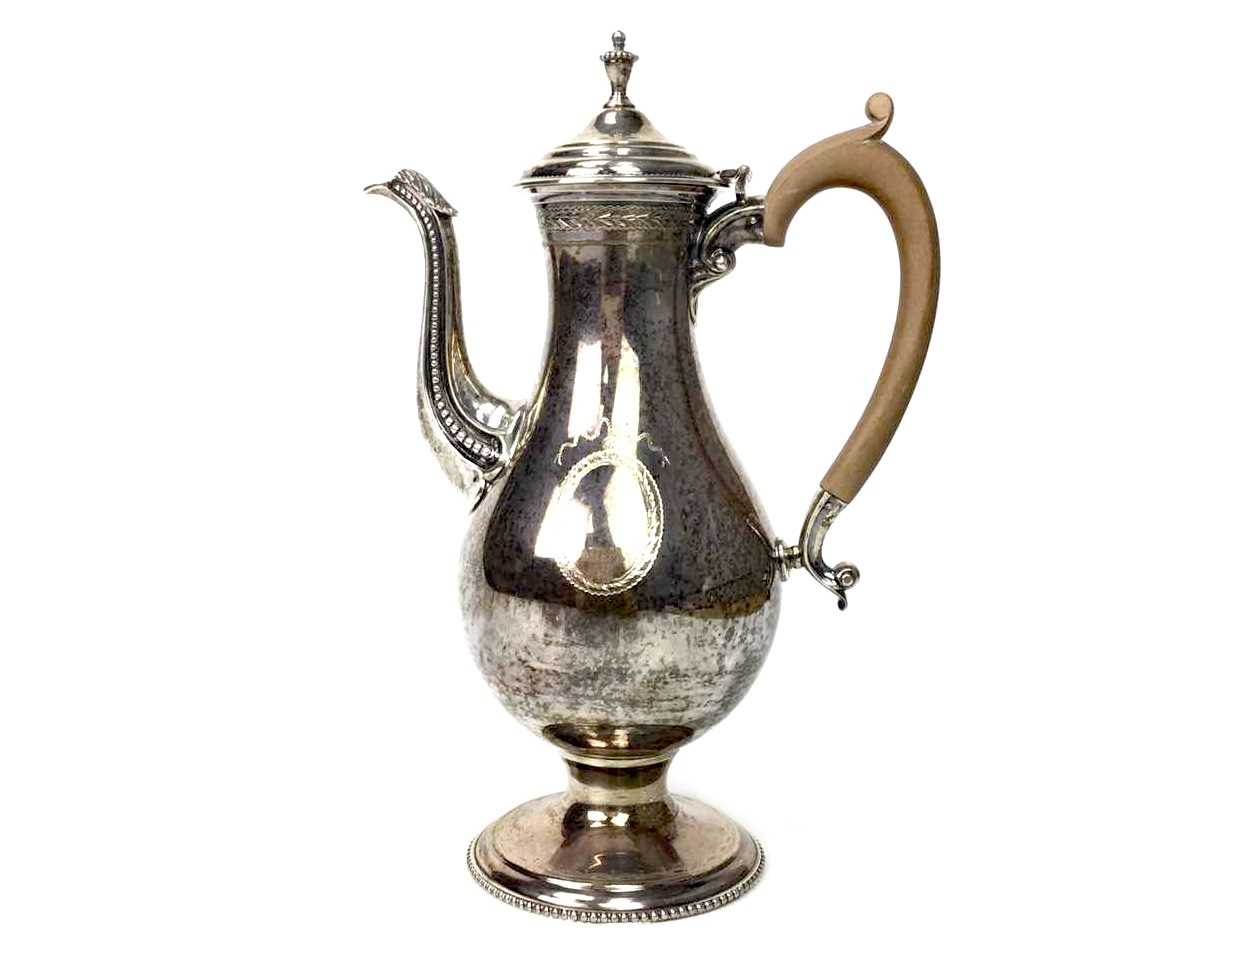 Lot 840 - A 20TH CENTURY SILVER COFFEE SERVICE